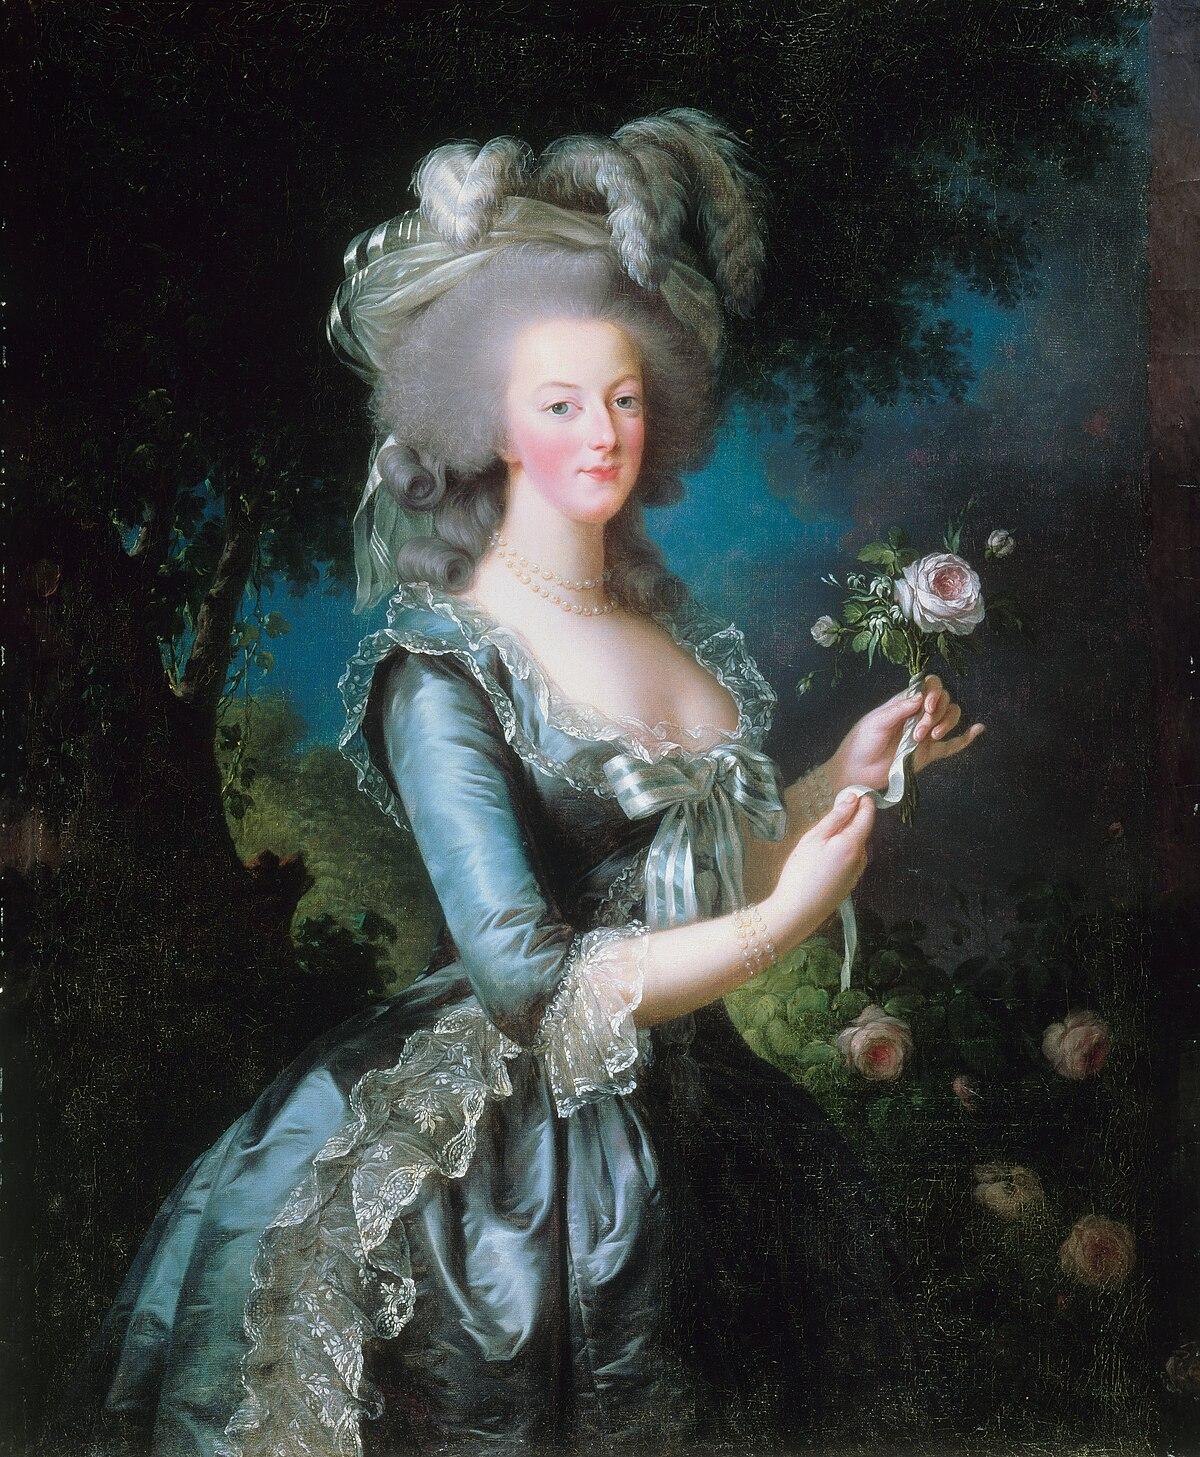 d773f16434719 Maria Antonietta d Asburgo-Lorena - Wikipedia